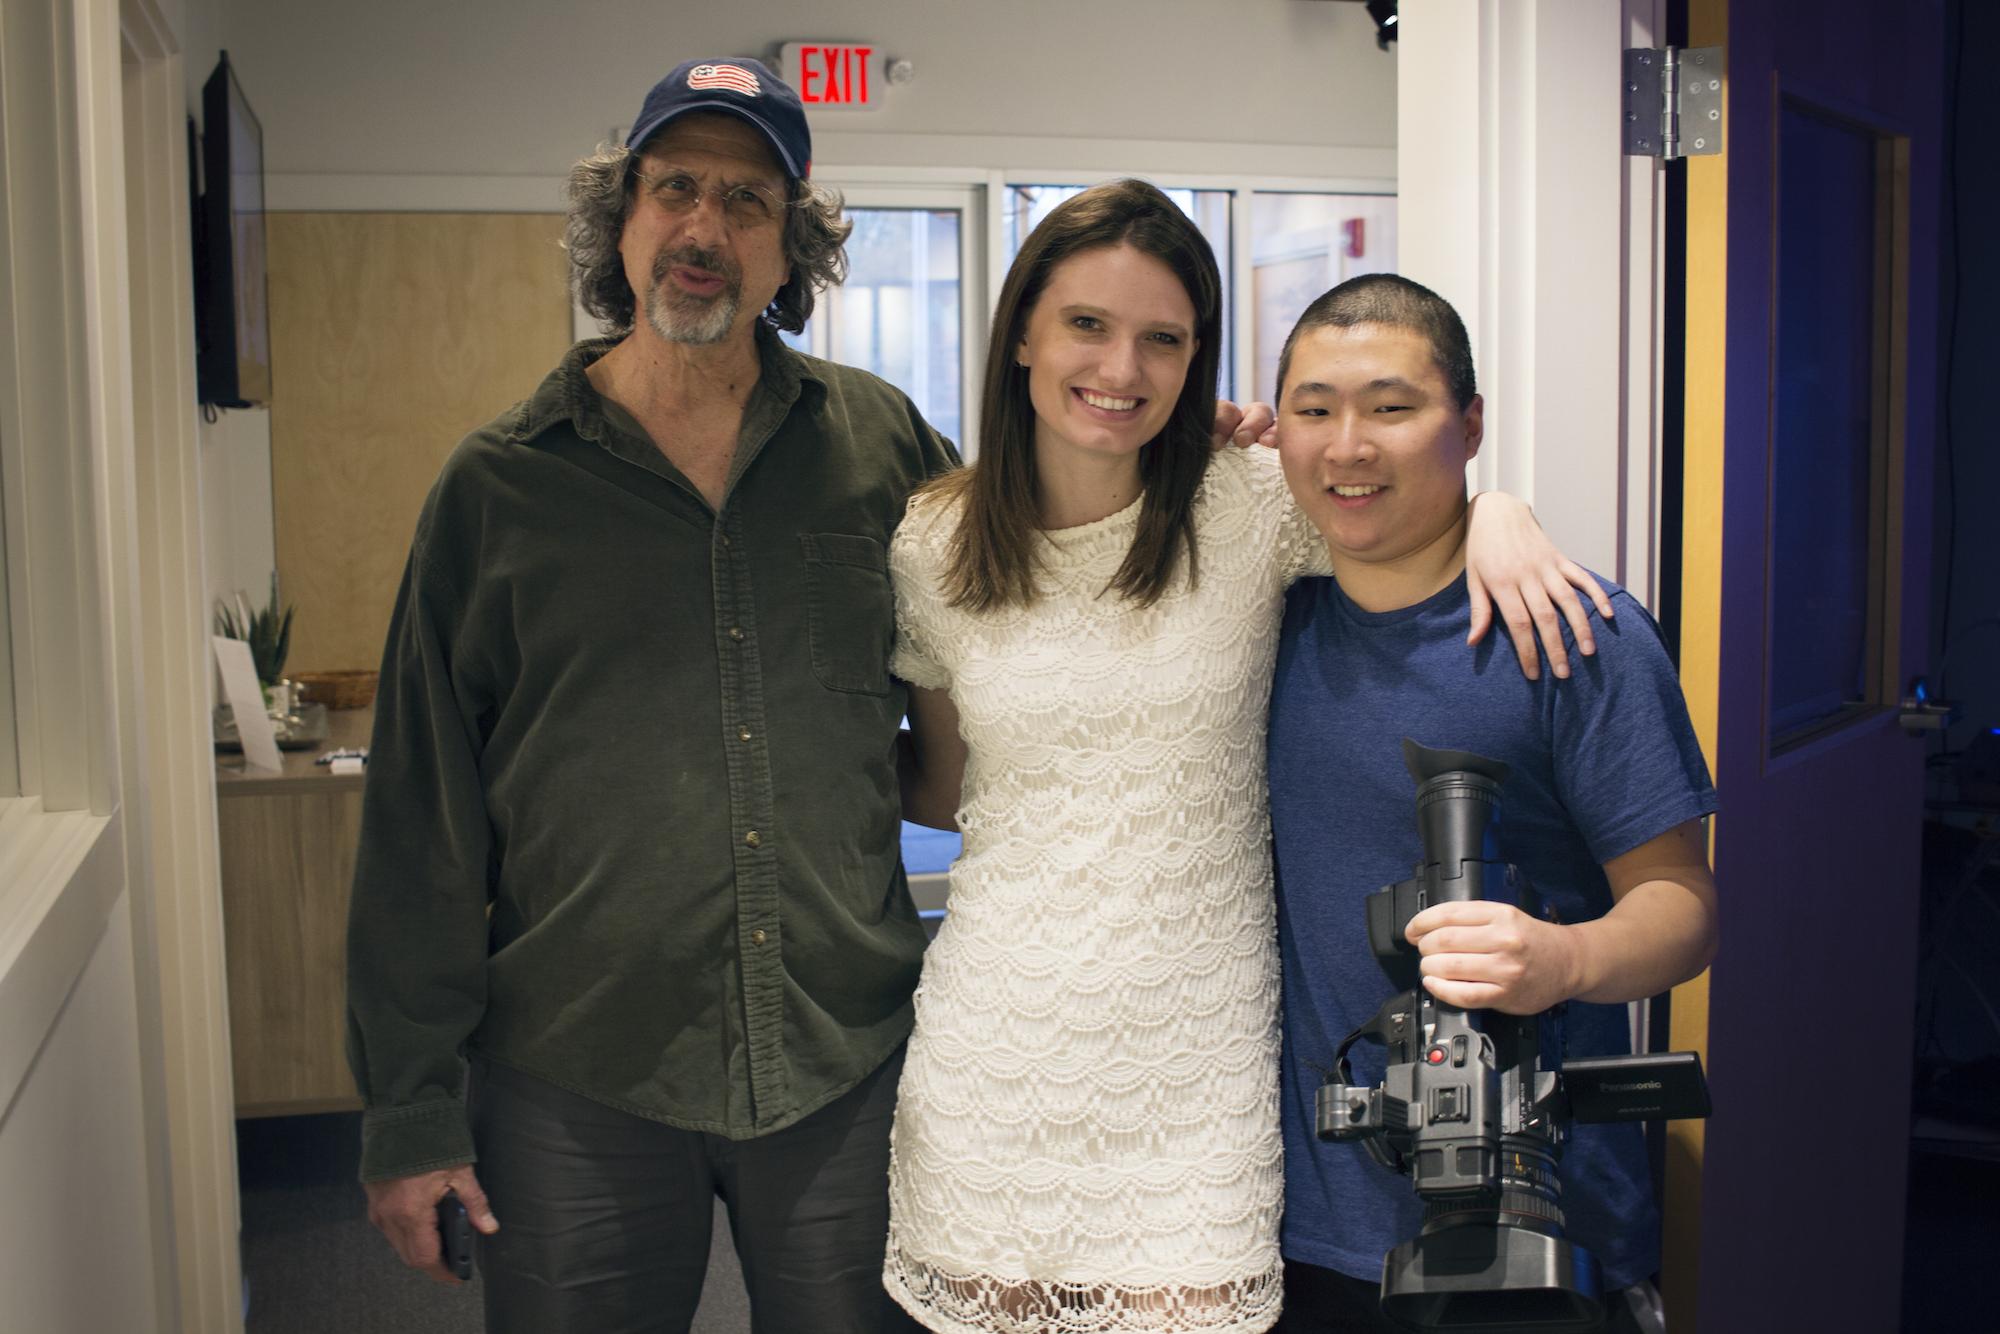 Chuck Ferullo, Alex and Sam at Geena Matuson's solo show reception at Medfield TV. April, 2016.